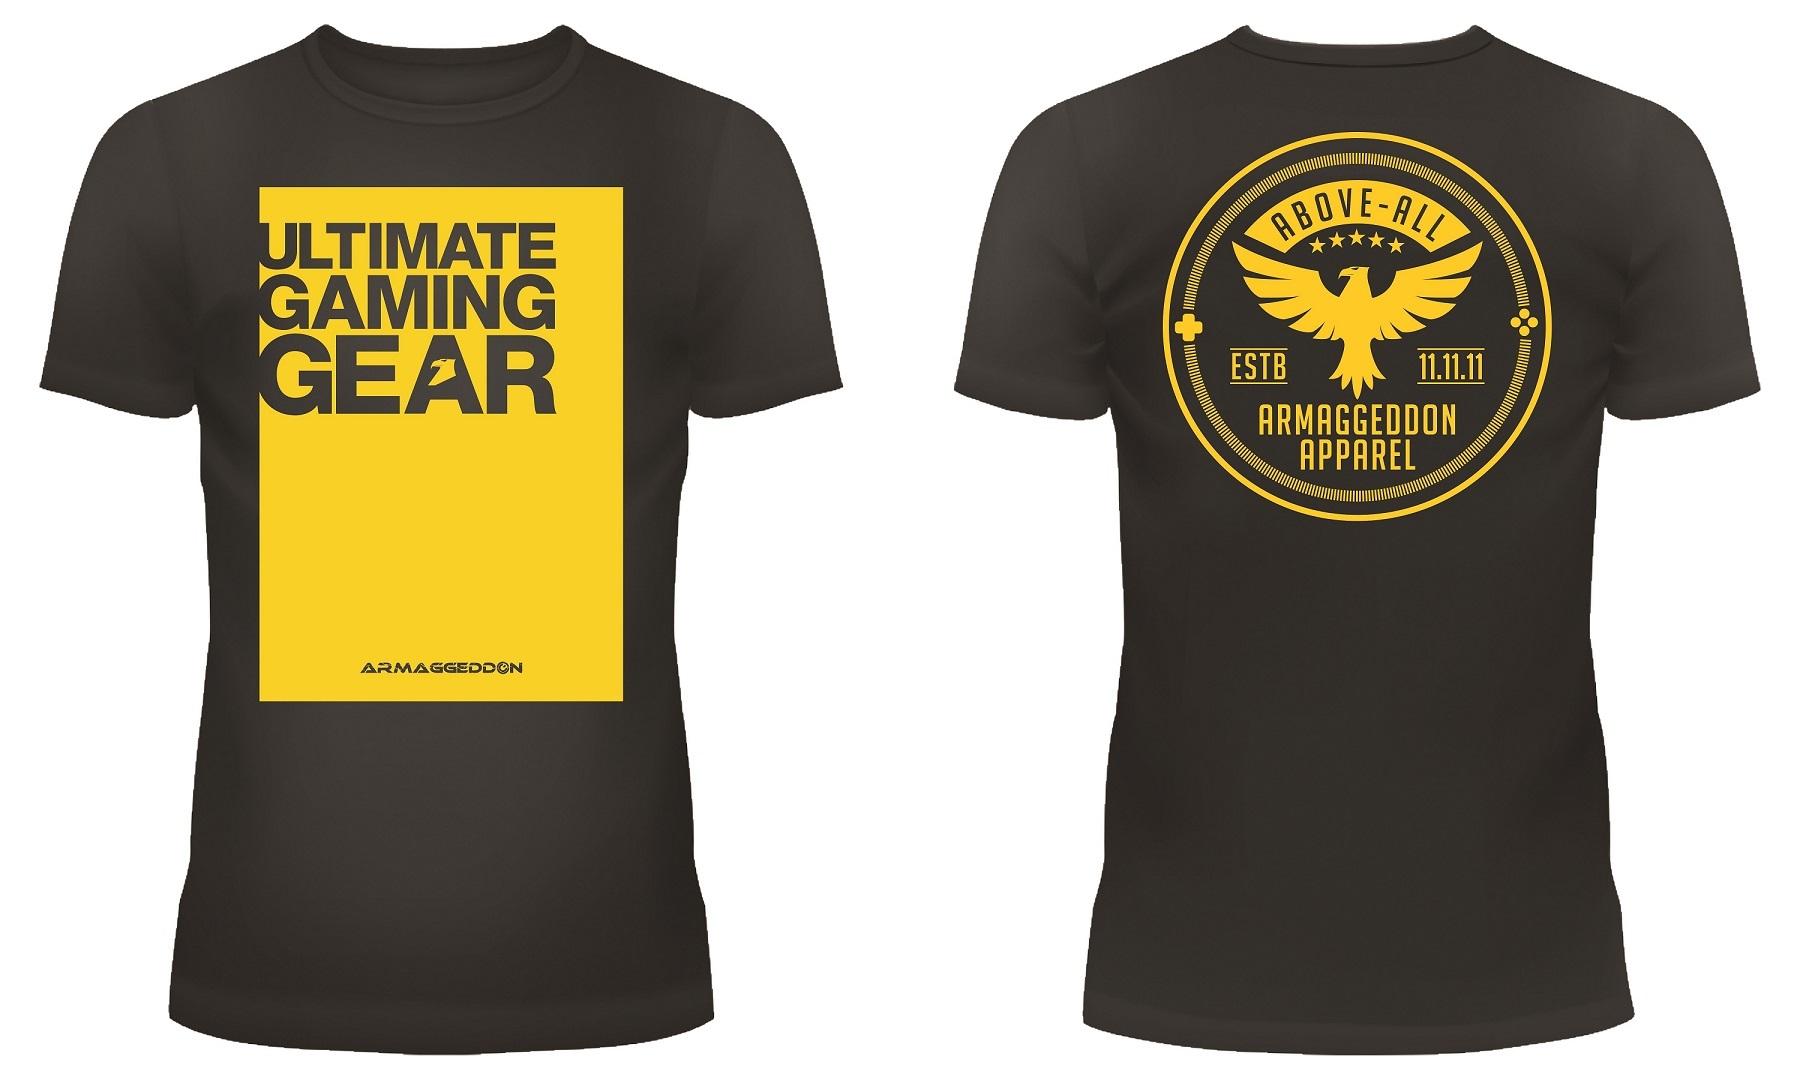 Armageddon FW186 Ultimate T-Shirt XL